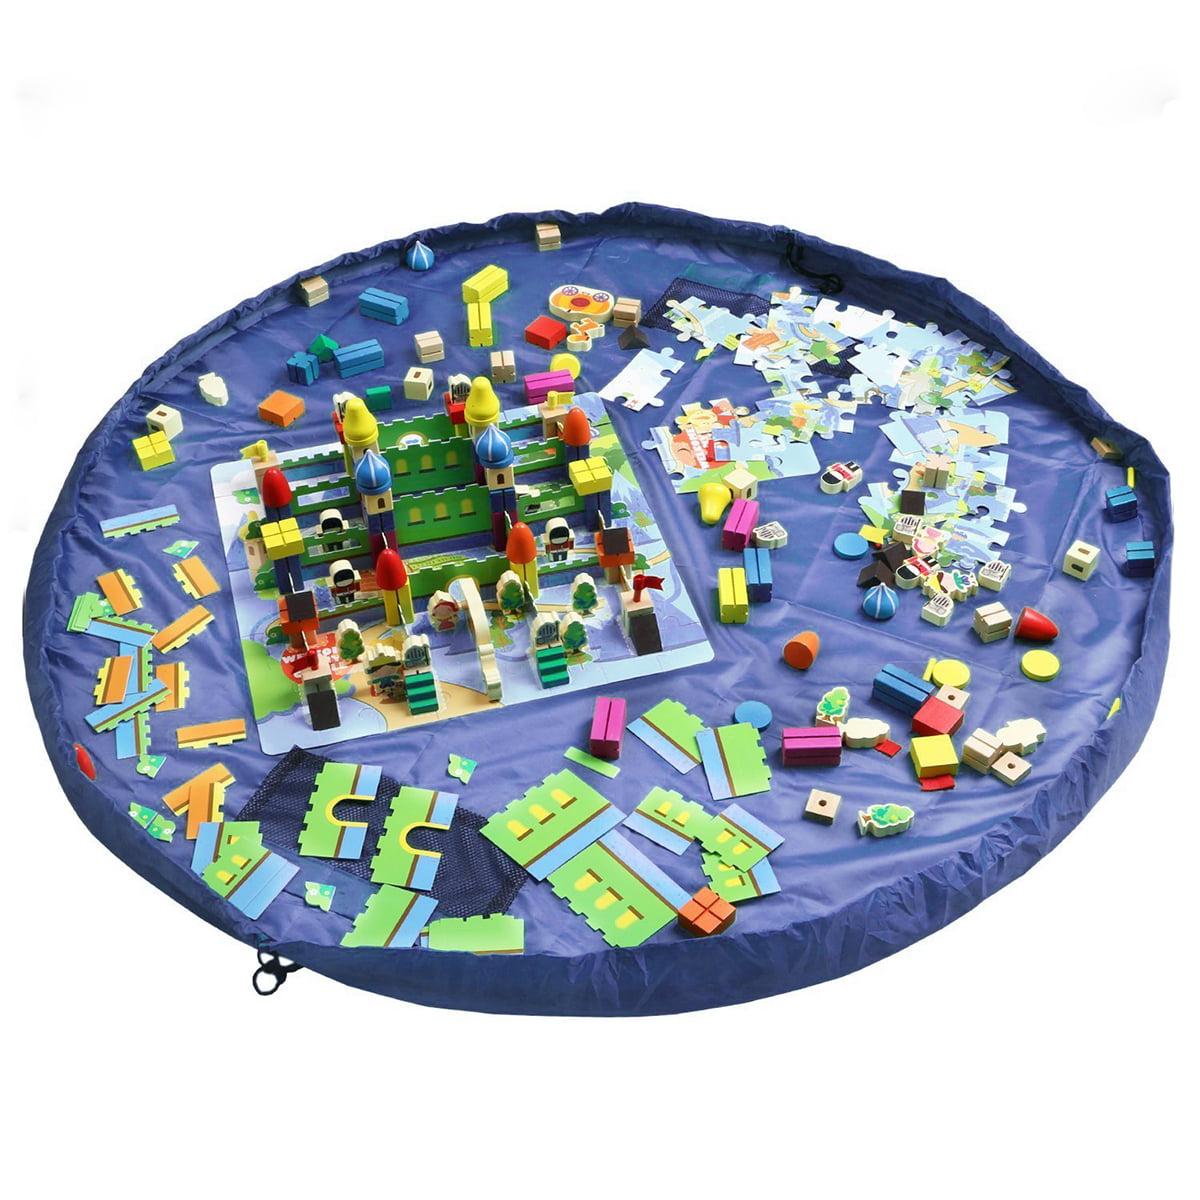 Portable Kids Play Mat Baby Toys Storage Bag Organizer  Picnic Mattress Rug Box